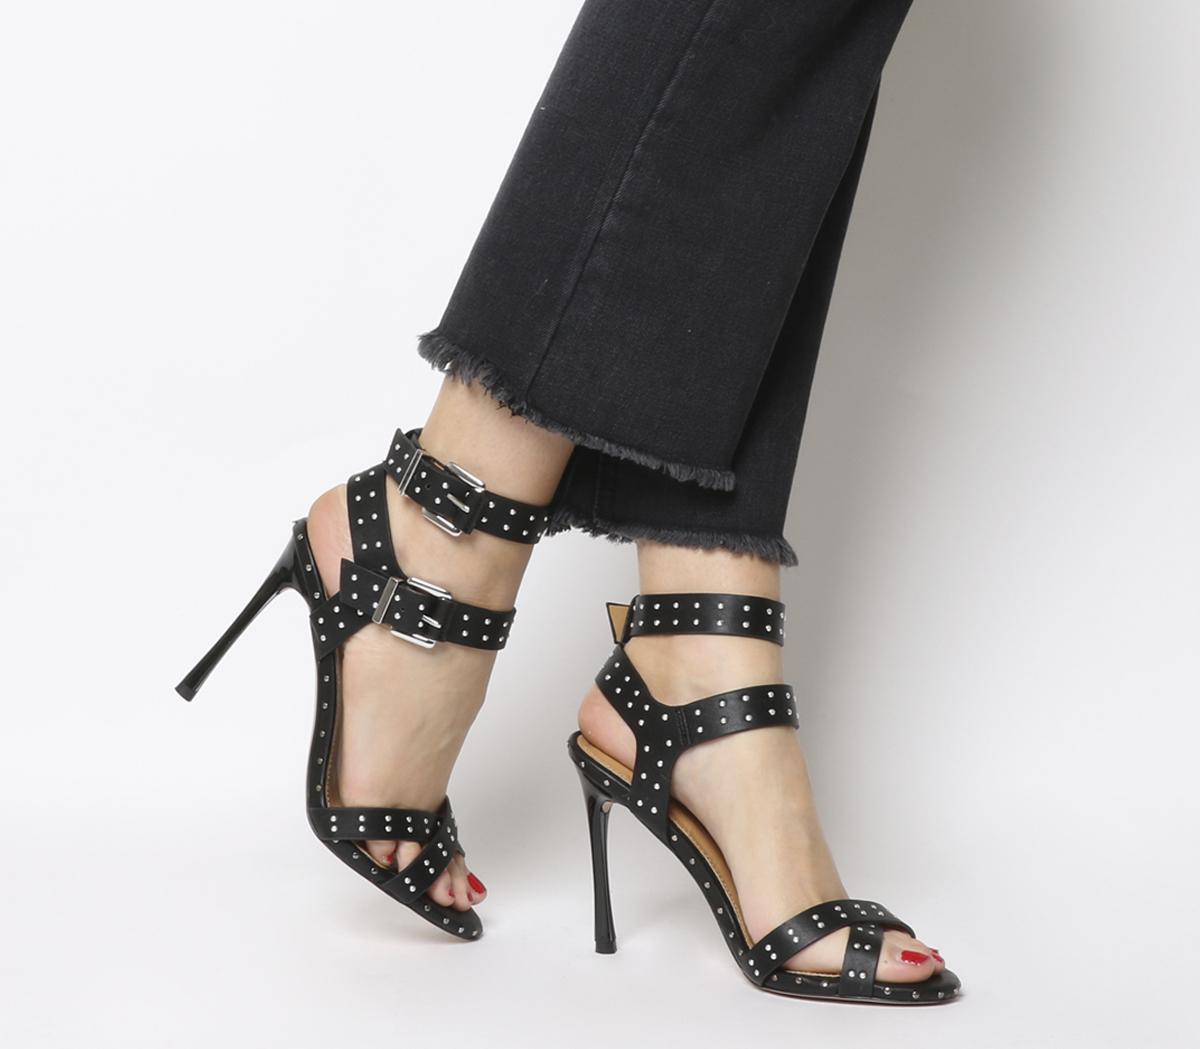 74463485d8c Sentinel Womens Office Hardcore Studded Stiletto Heels Black Heels